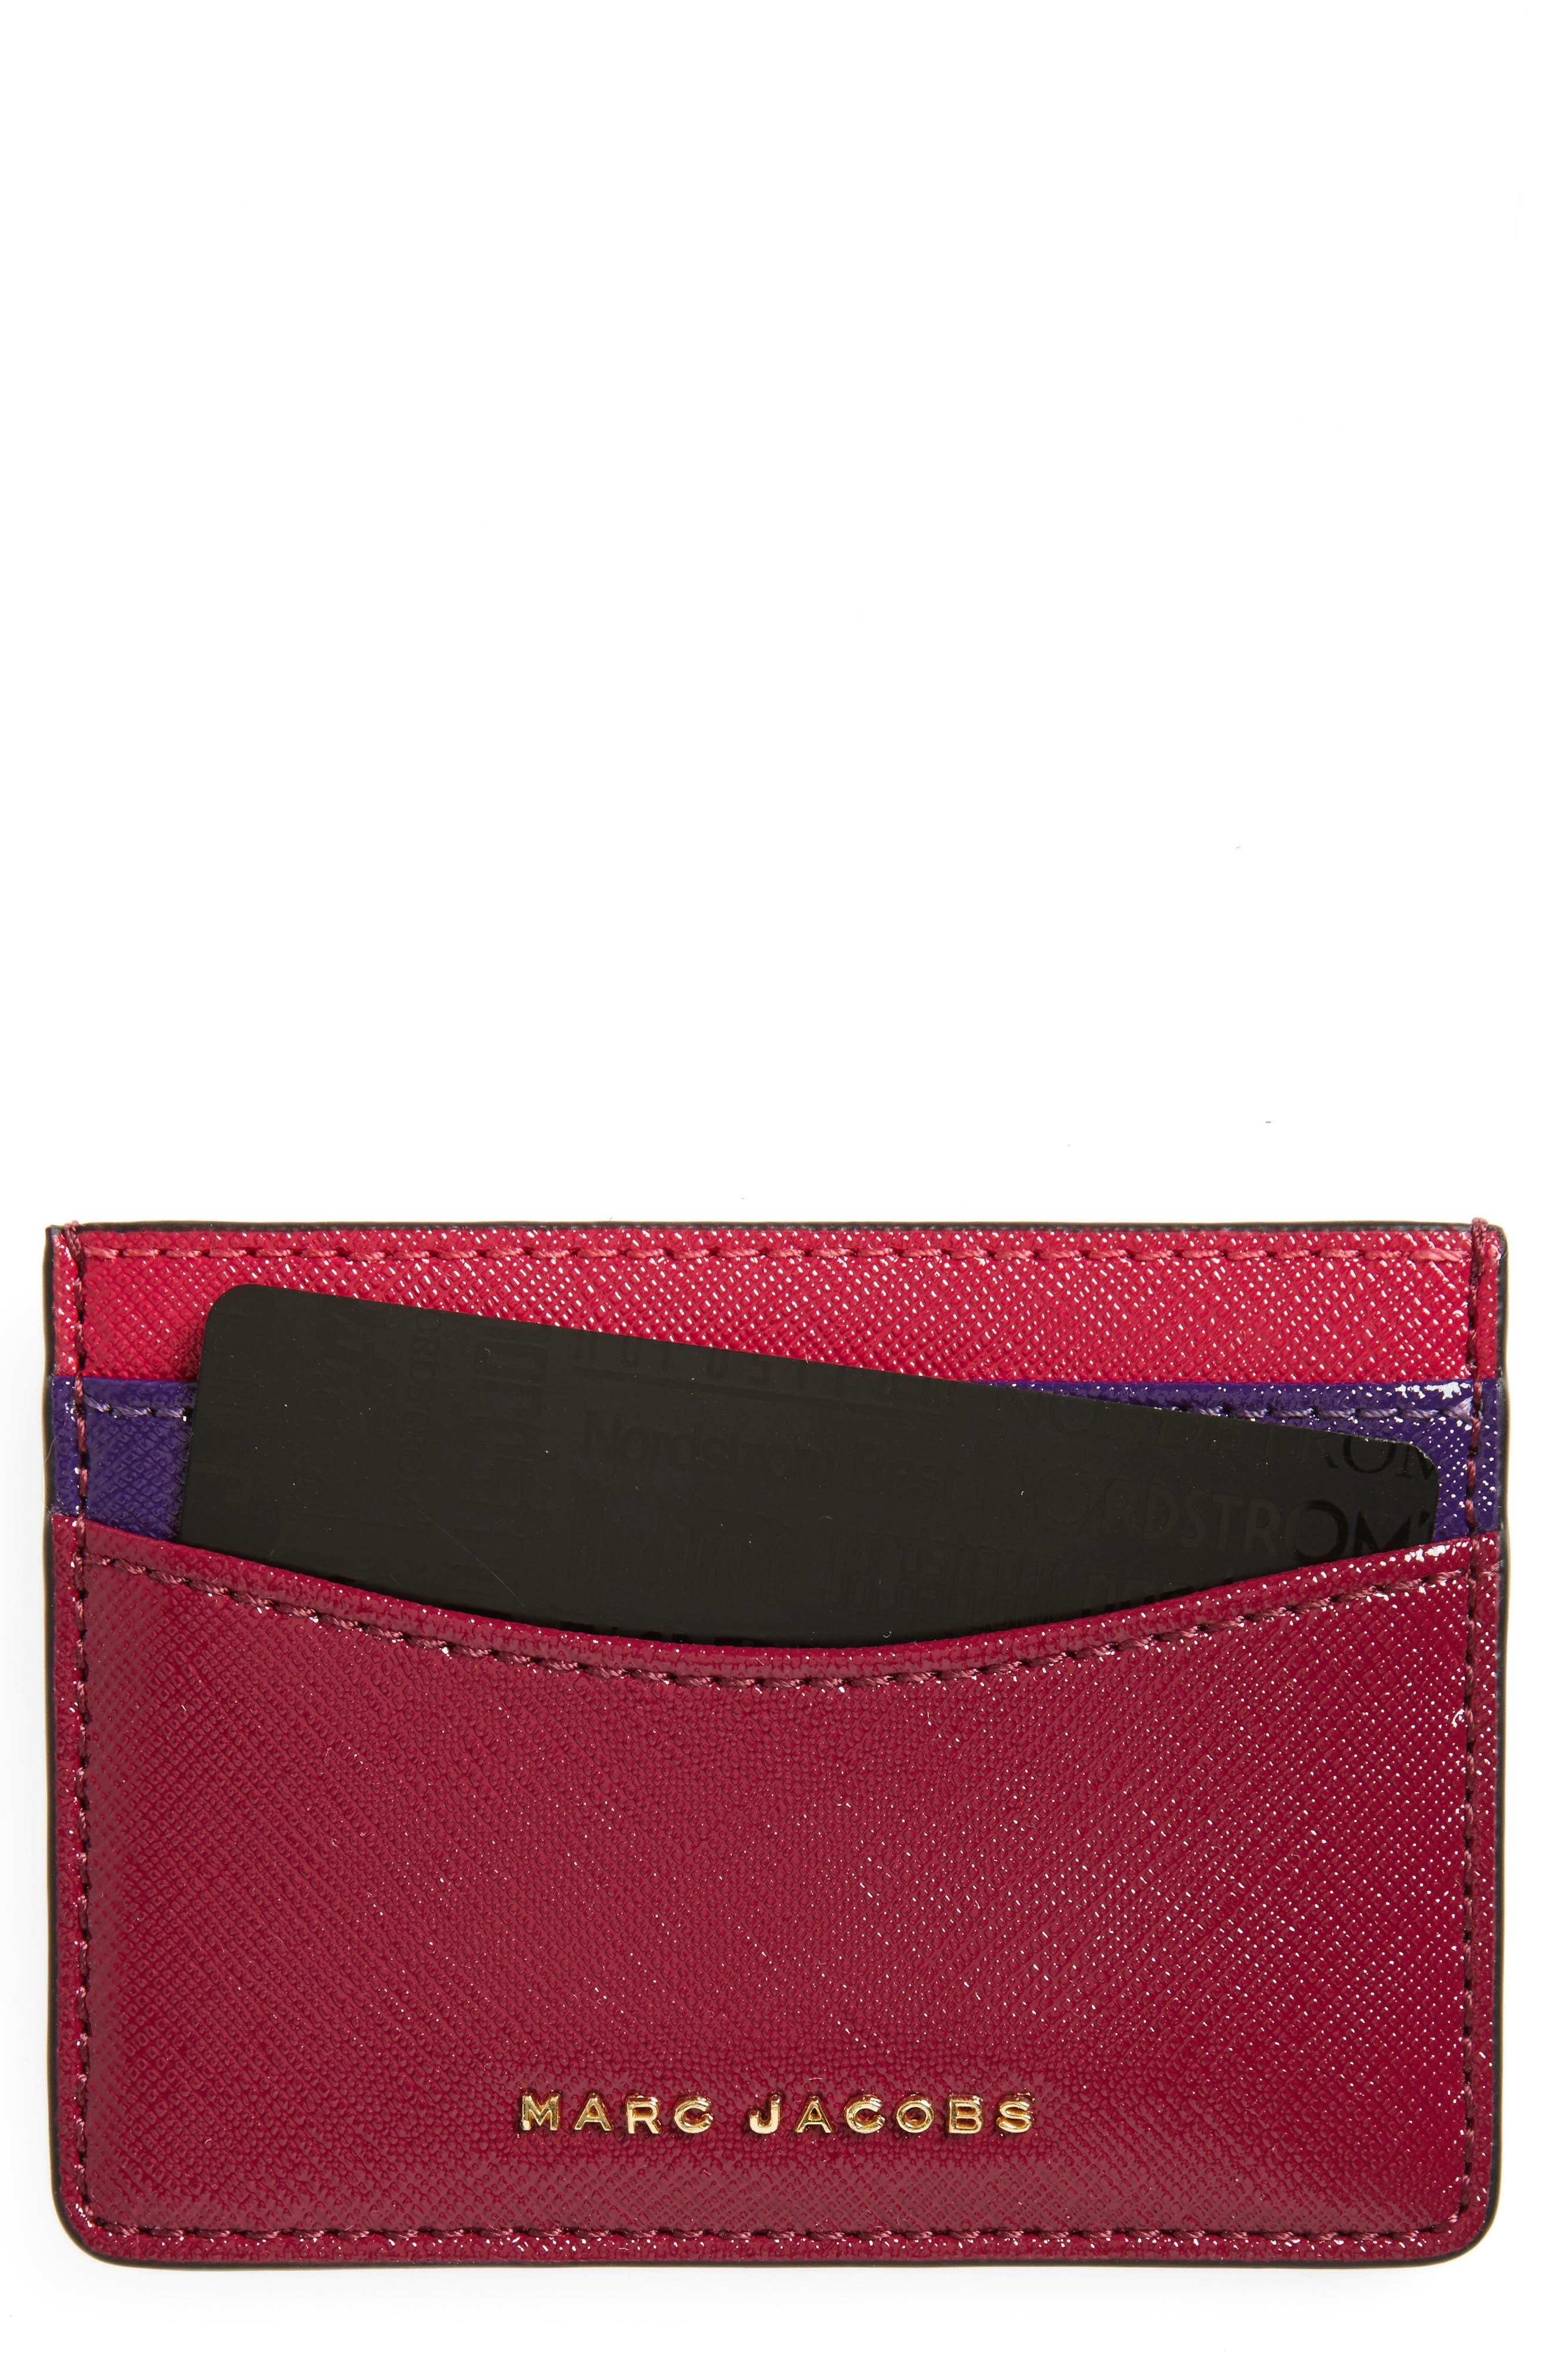 Color Block Saffiano Leather Card Case,                             Main thumbnail 4, color,